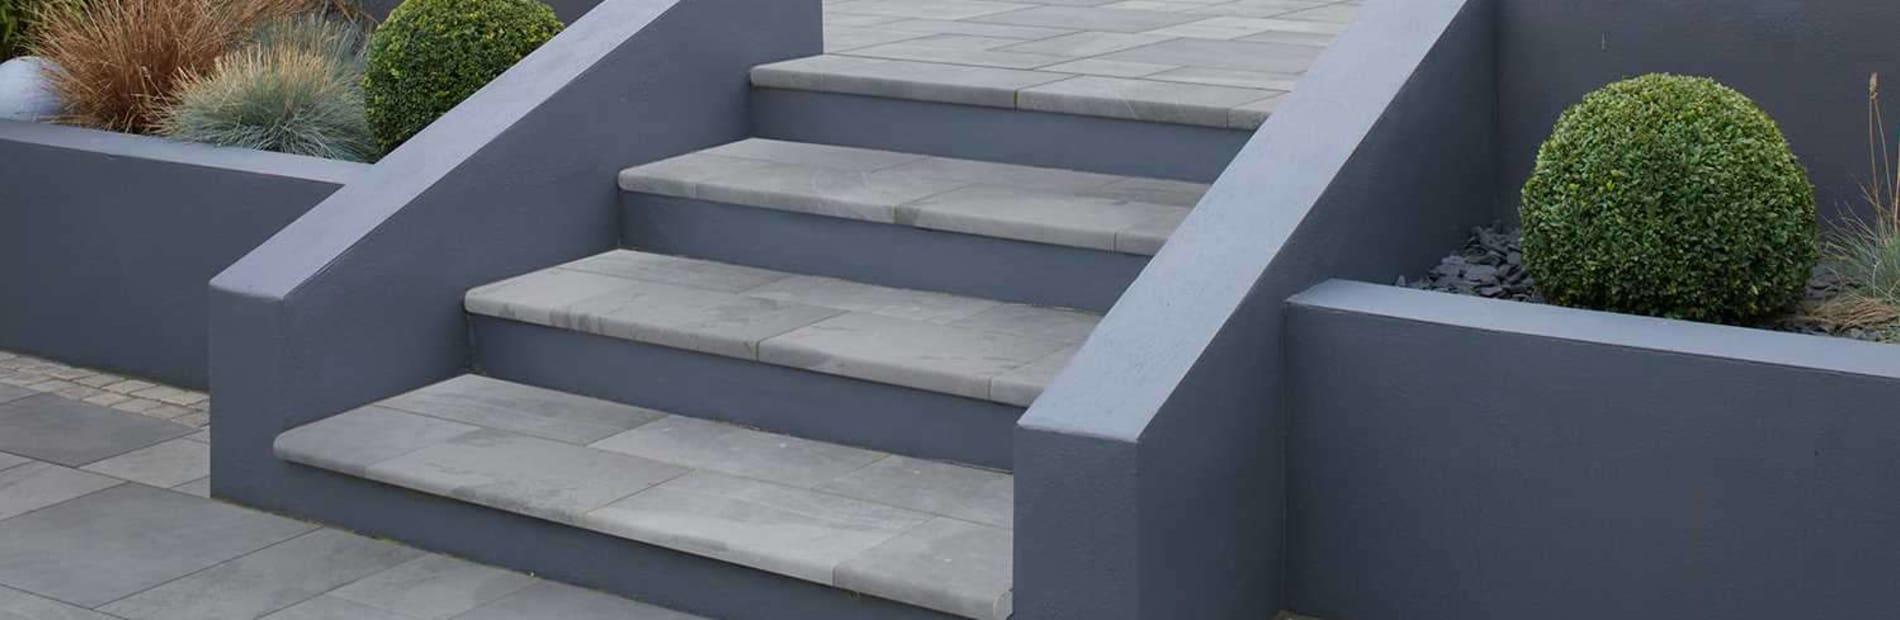 Casarta Slate Steps hero image